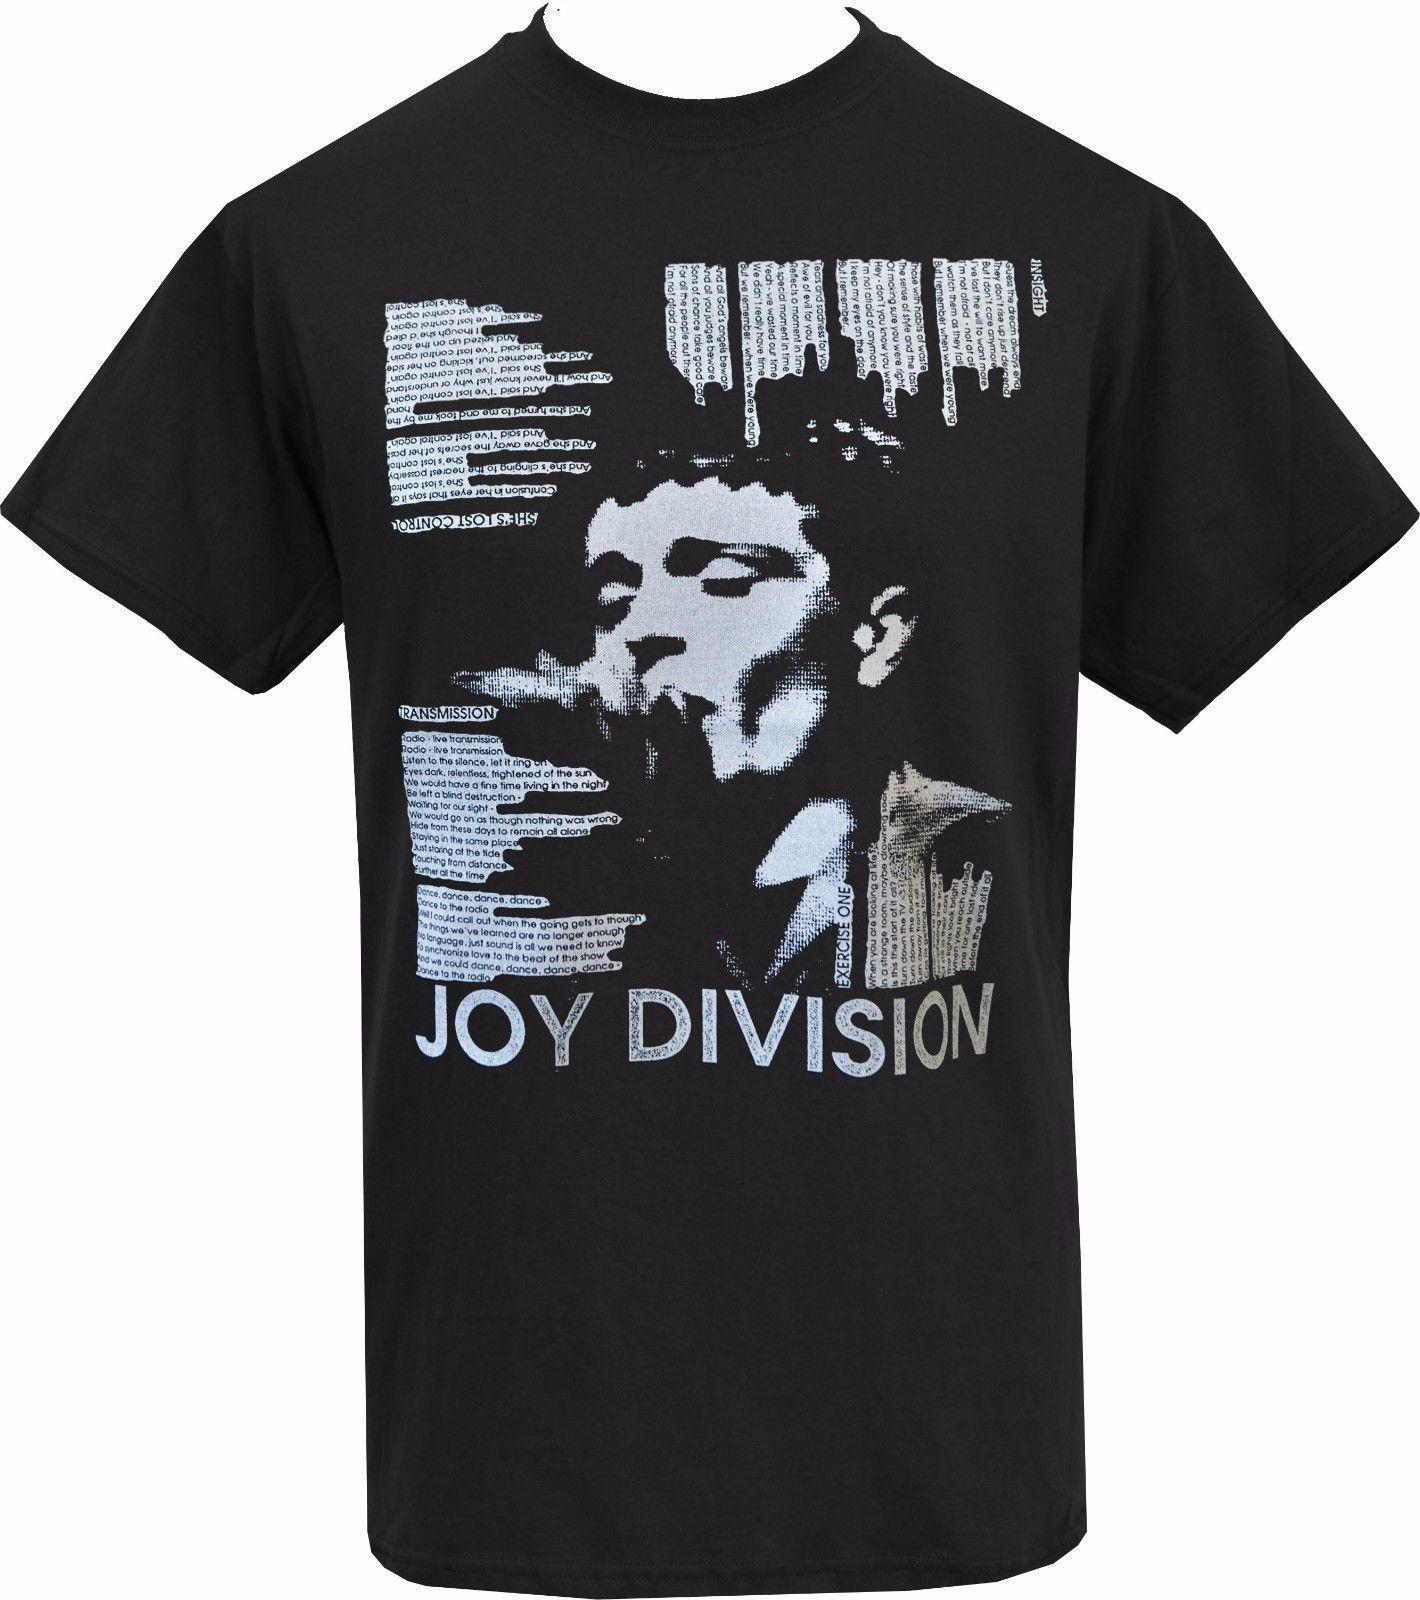 46166b9e0a MENS BLACK T SHIRT JOY DIVISION LYRICS IAN CURTIS POST PUNK ROCK CONTROL S  5XL Cool Tshirt Designs Create T Shirt From Sevenshopping, $11.01|  DHgate.Com